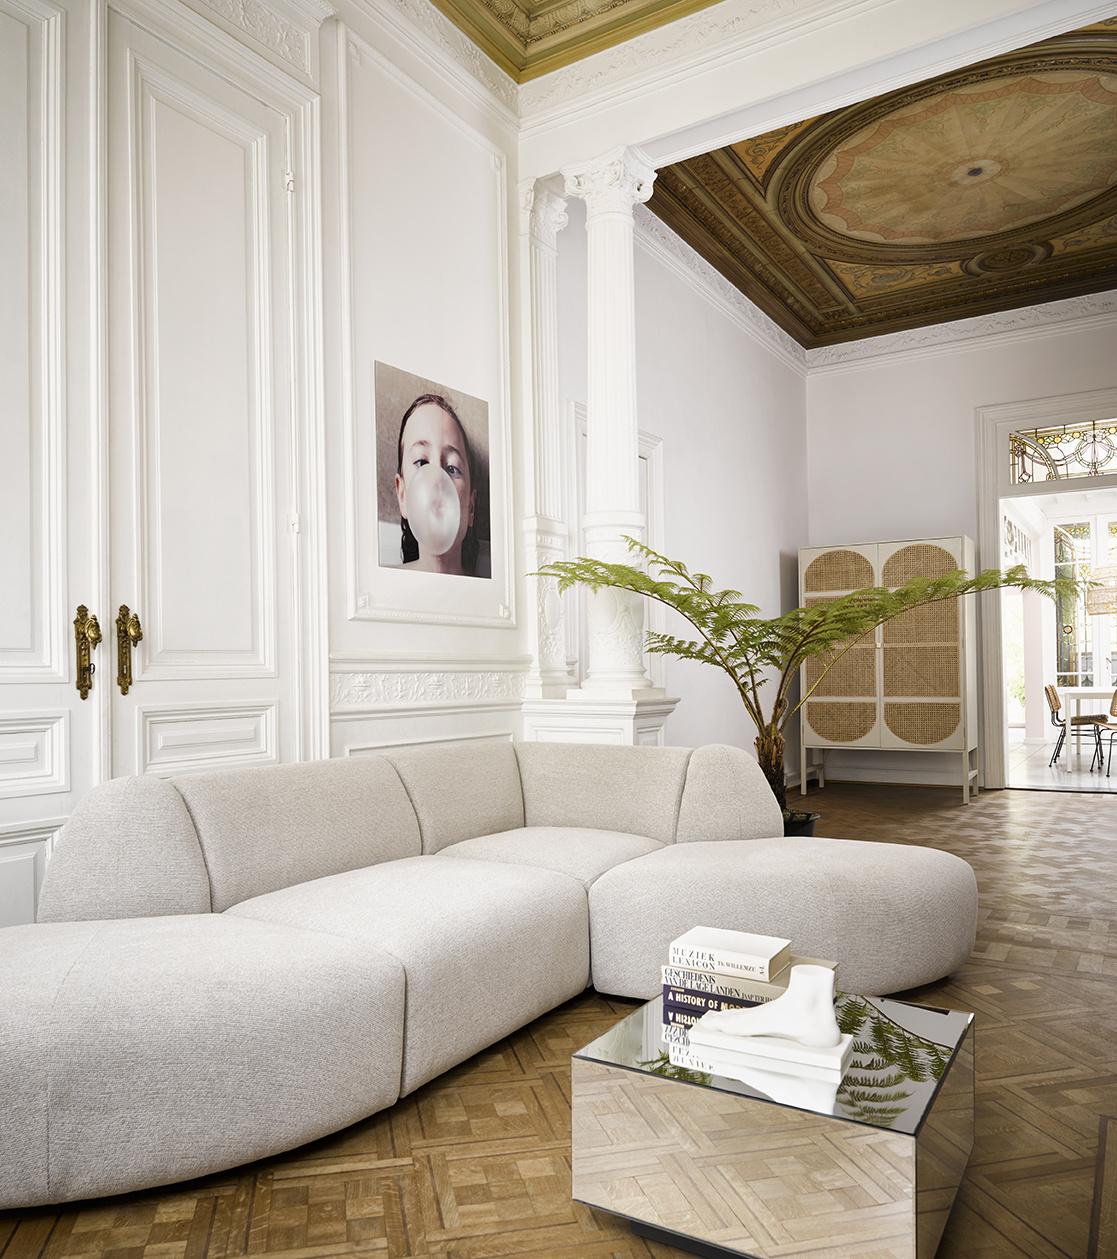 Bank jax couch: element left, sneak, light grey-2